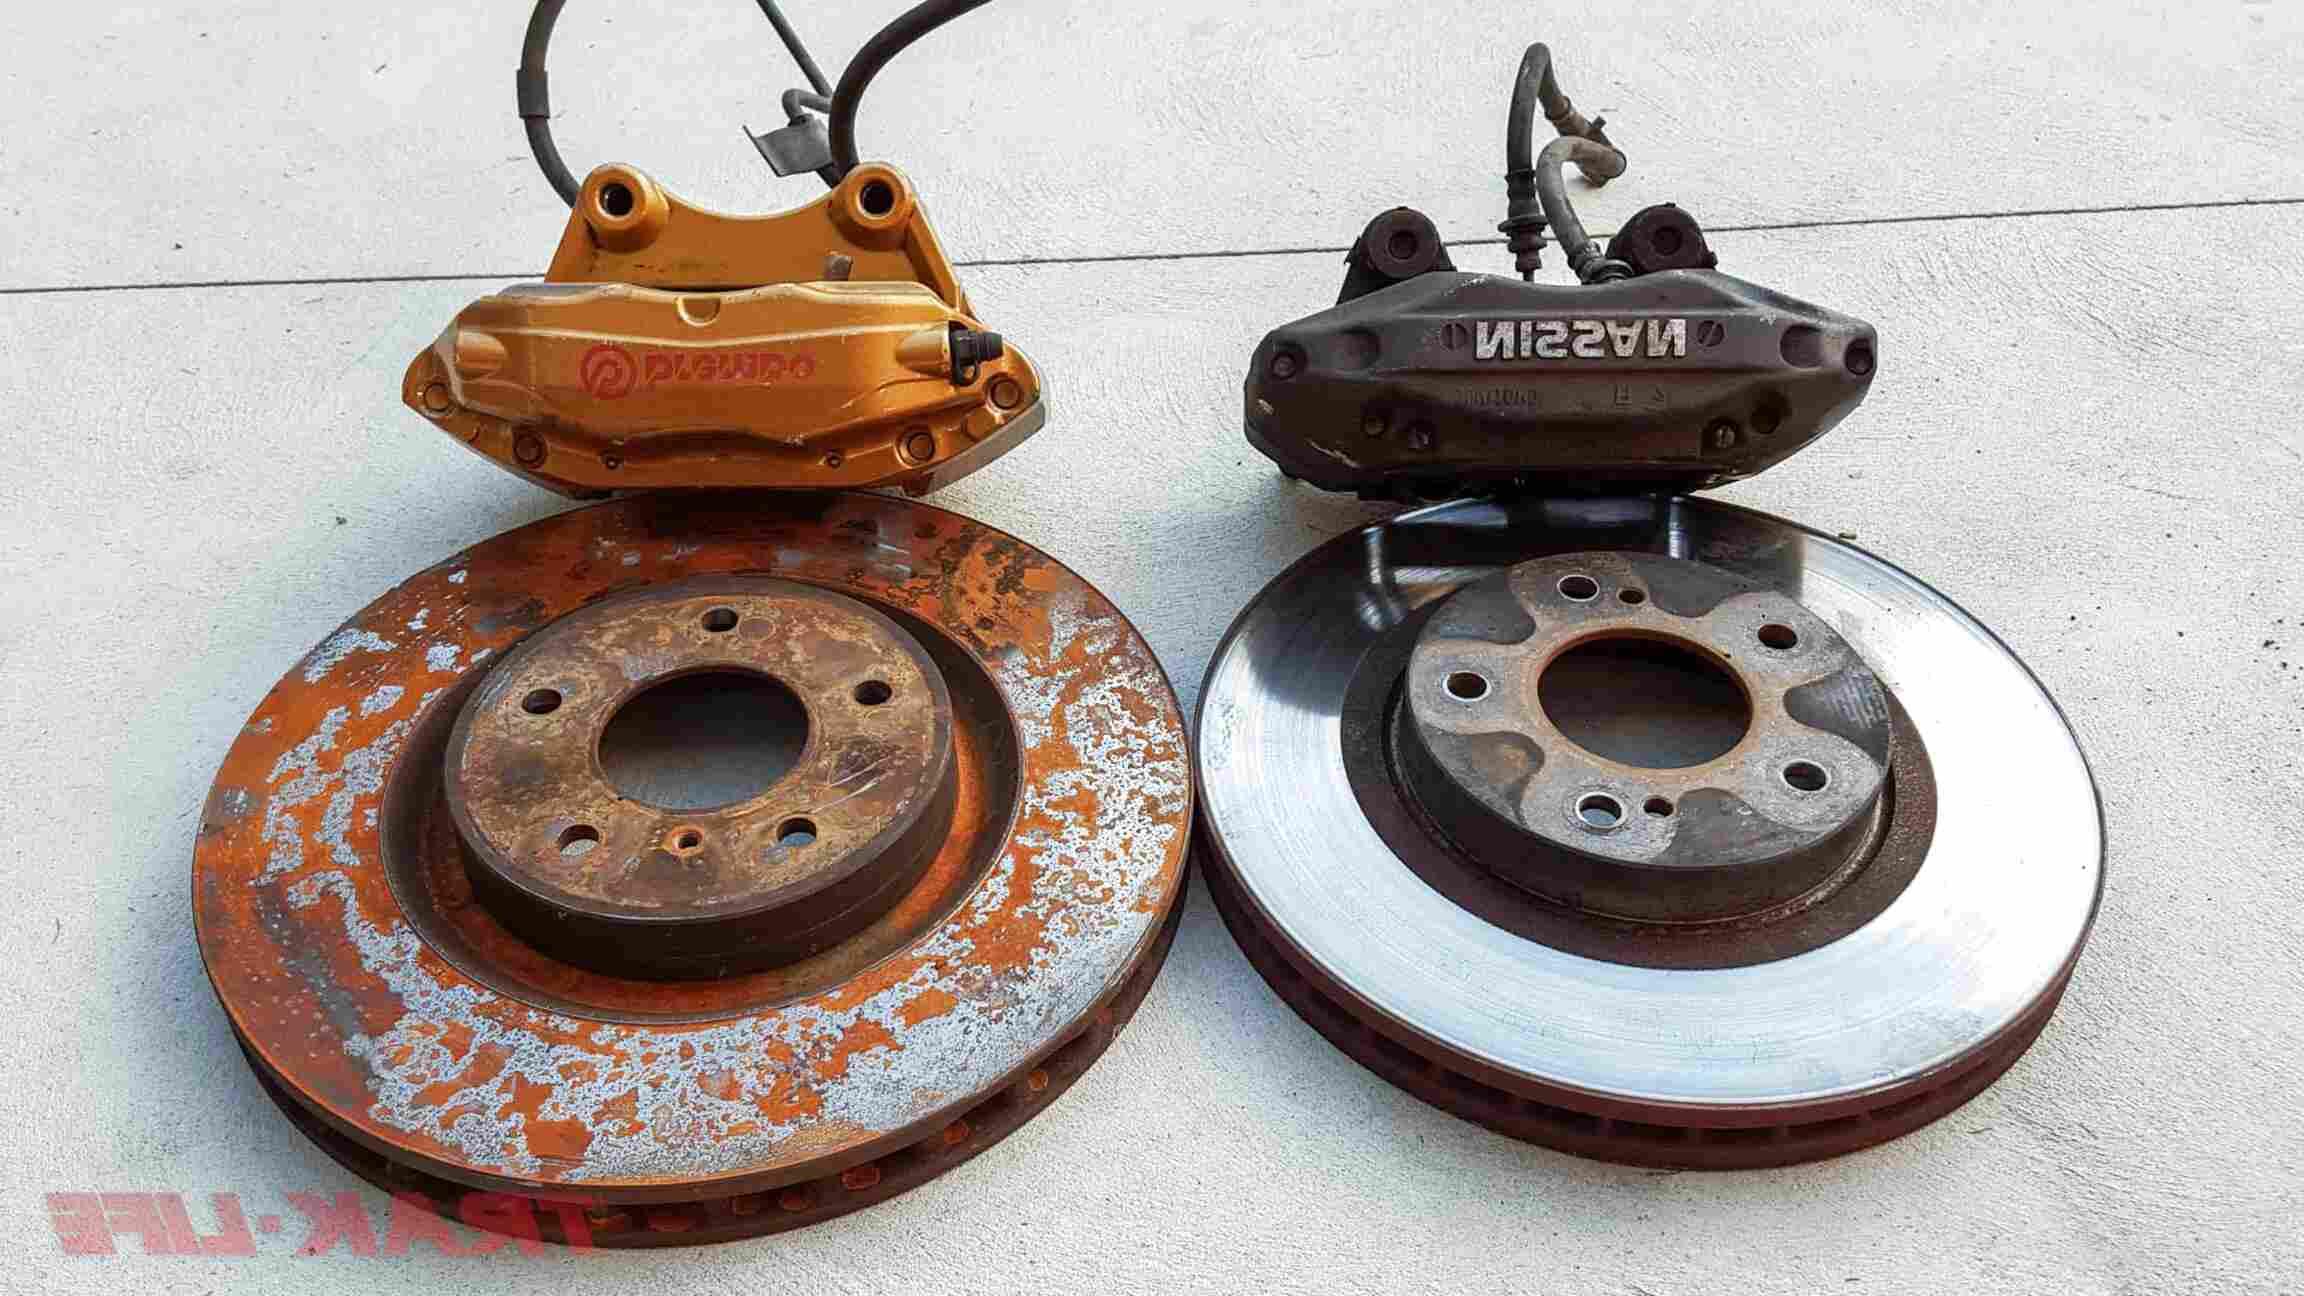 r33 gtst brakes for sale